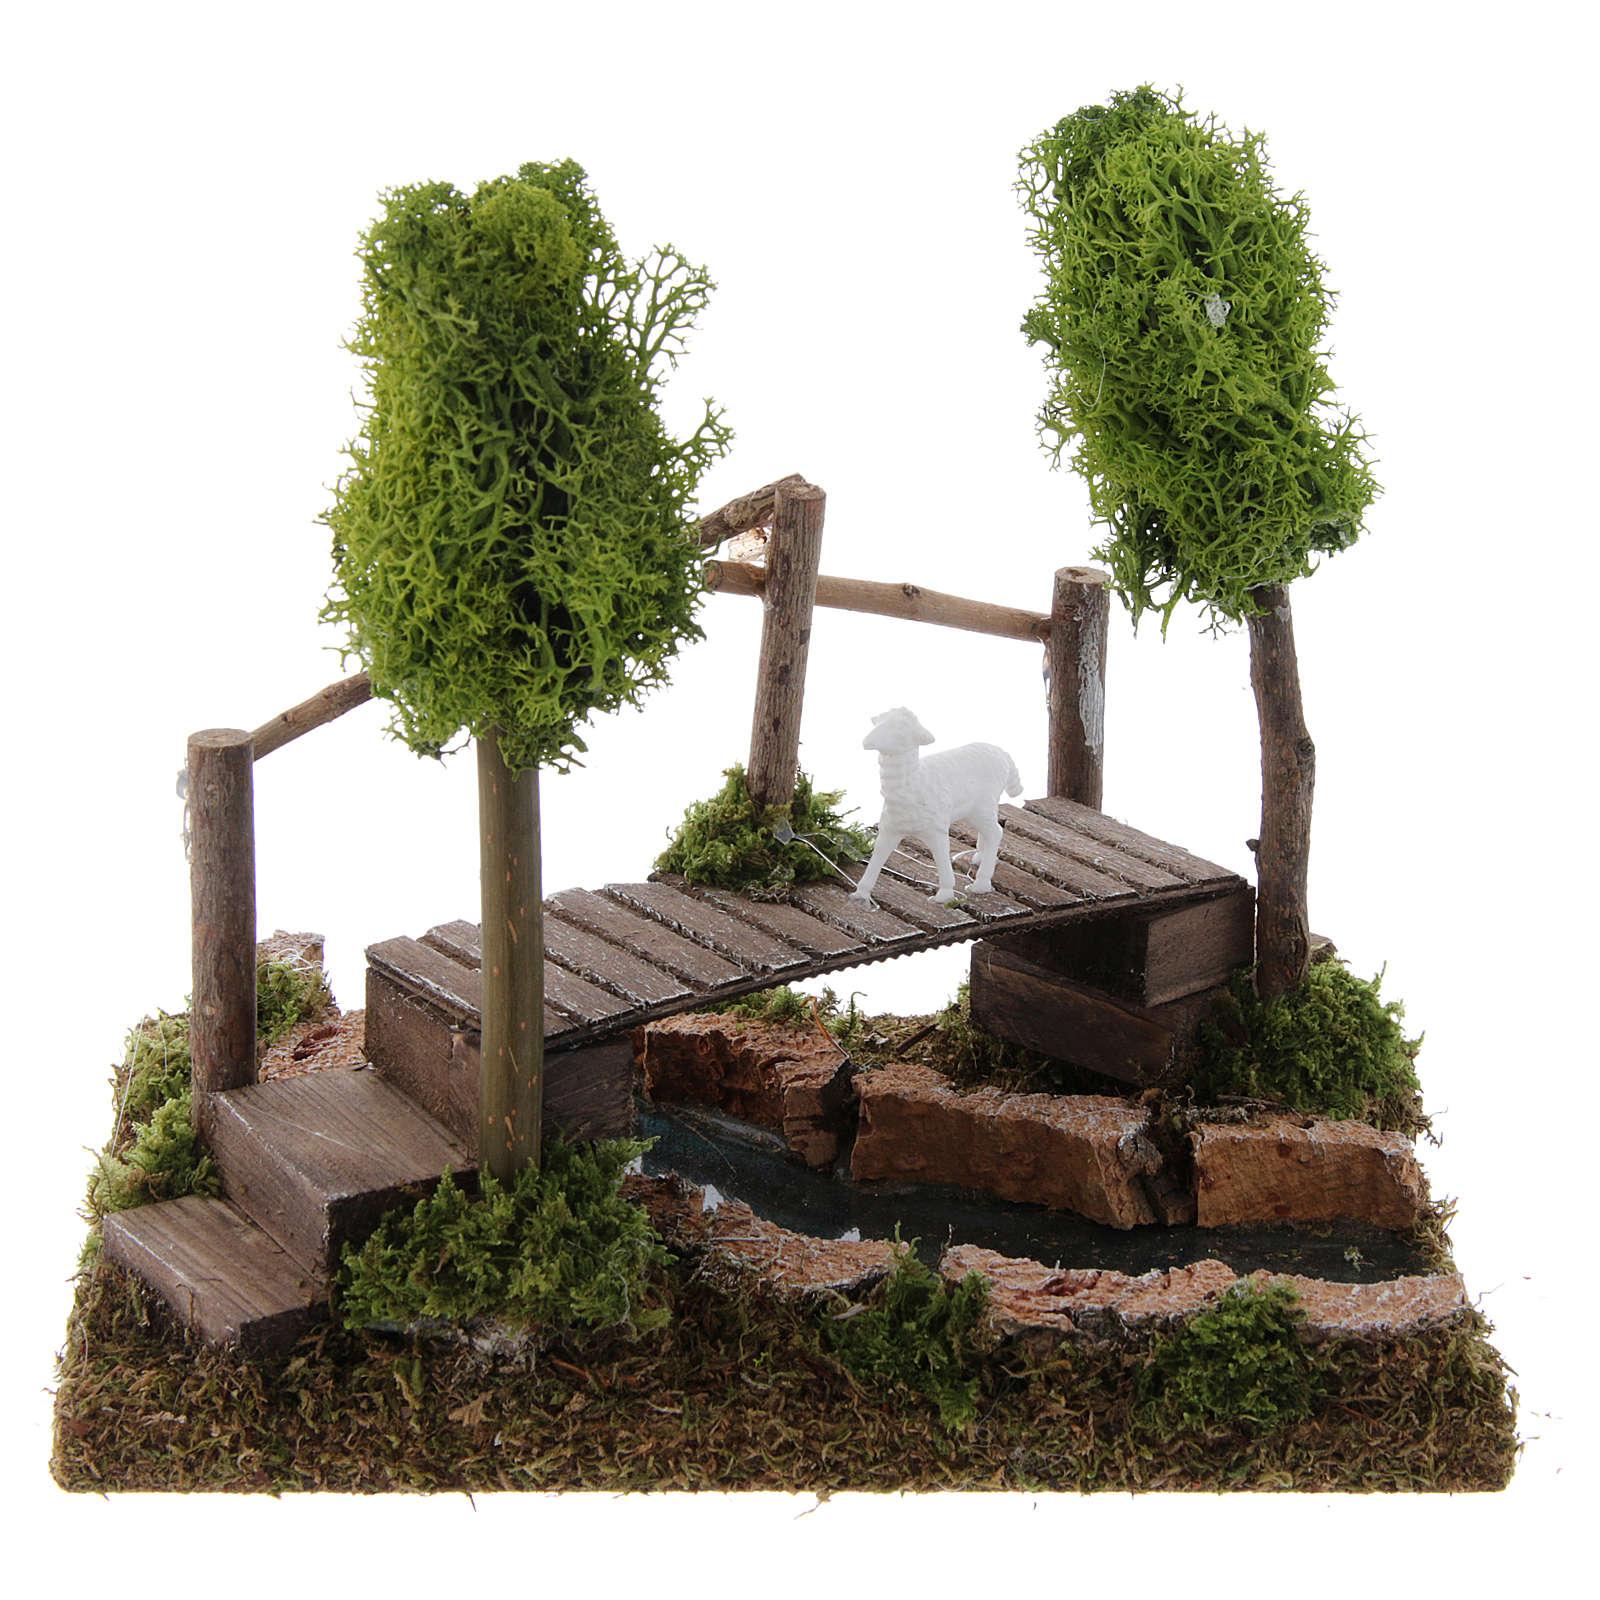 Nativity setting, river with bridge and lichen trees 4